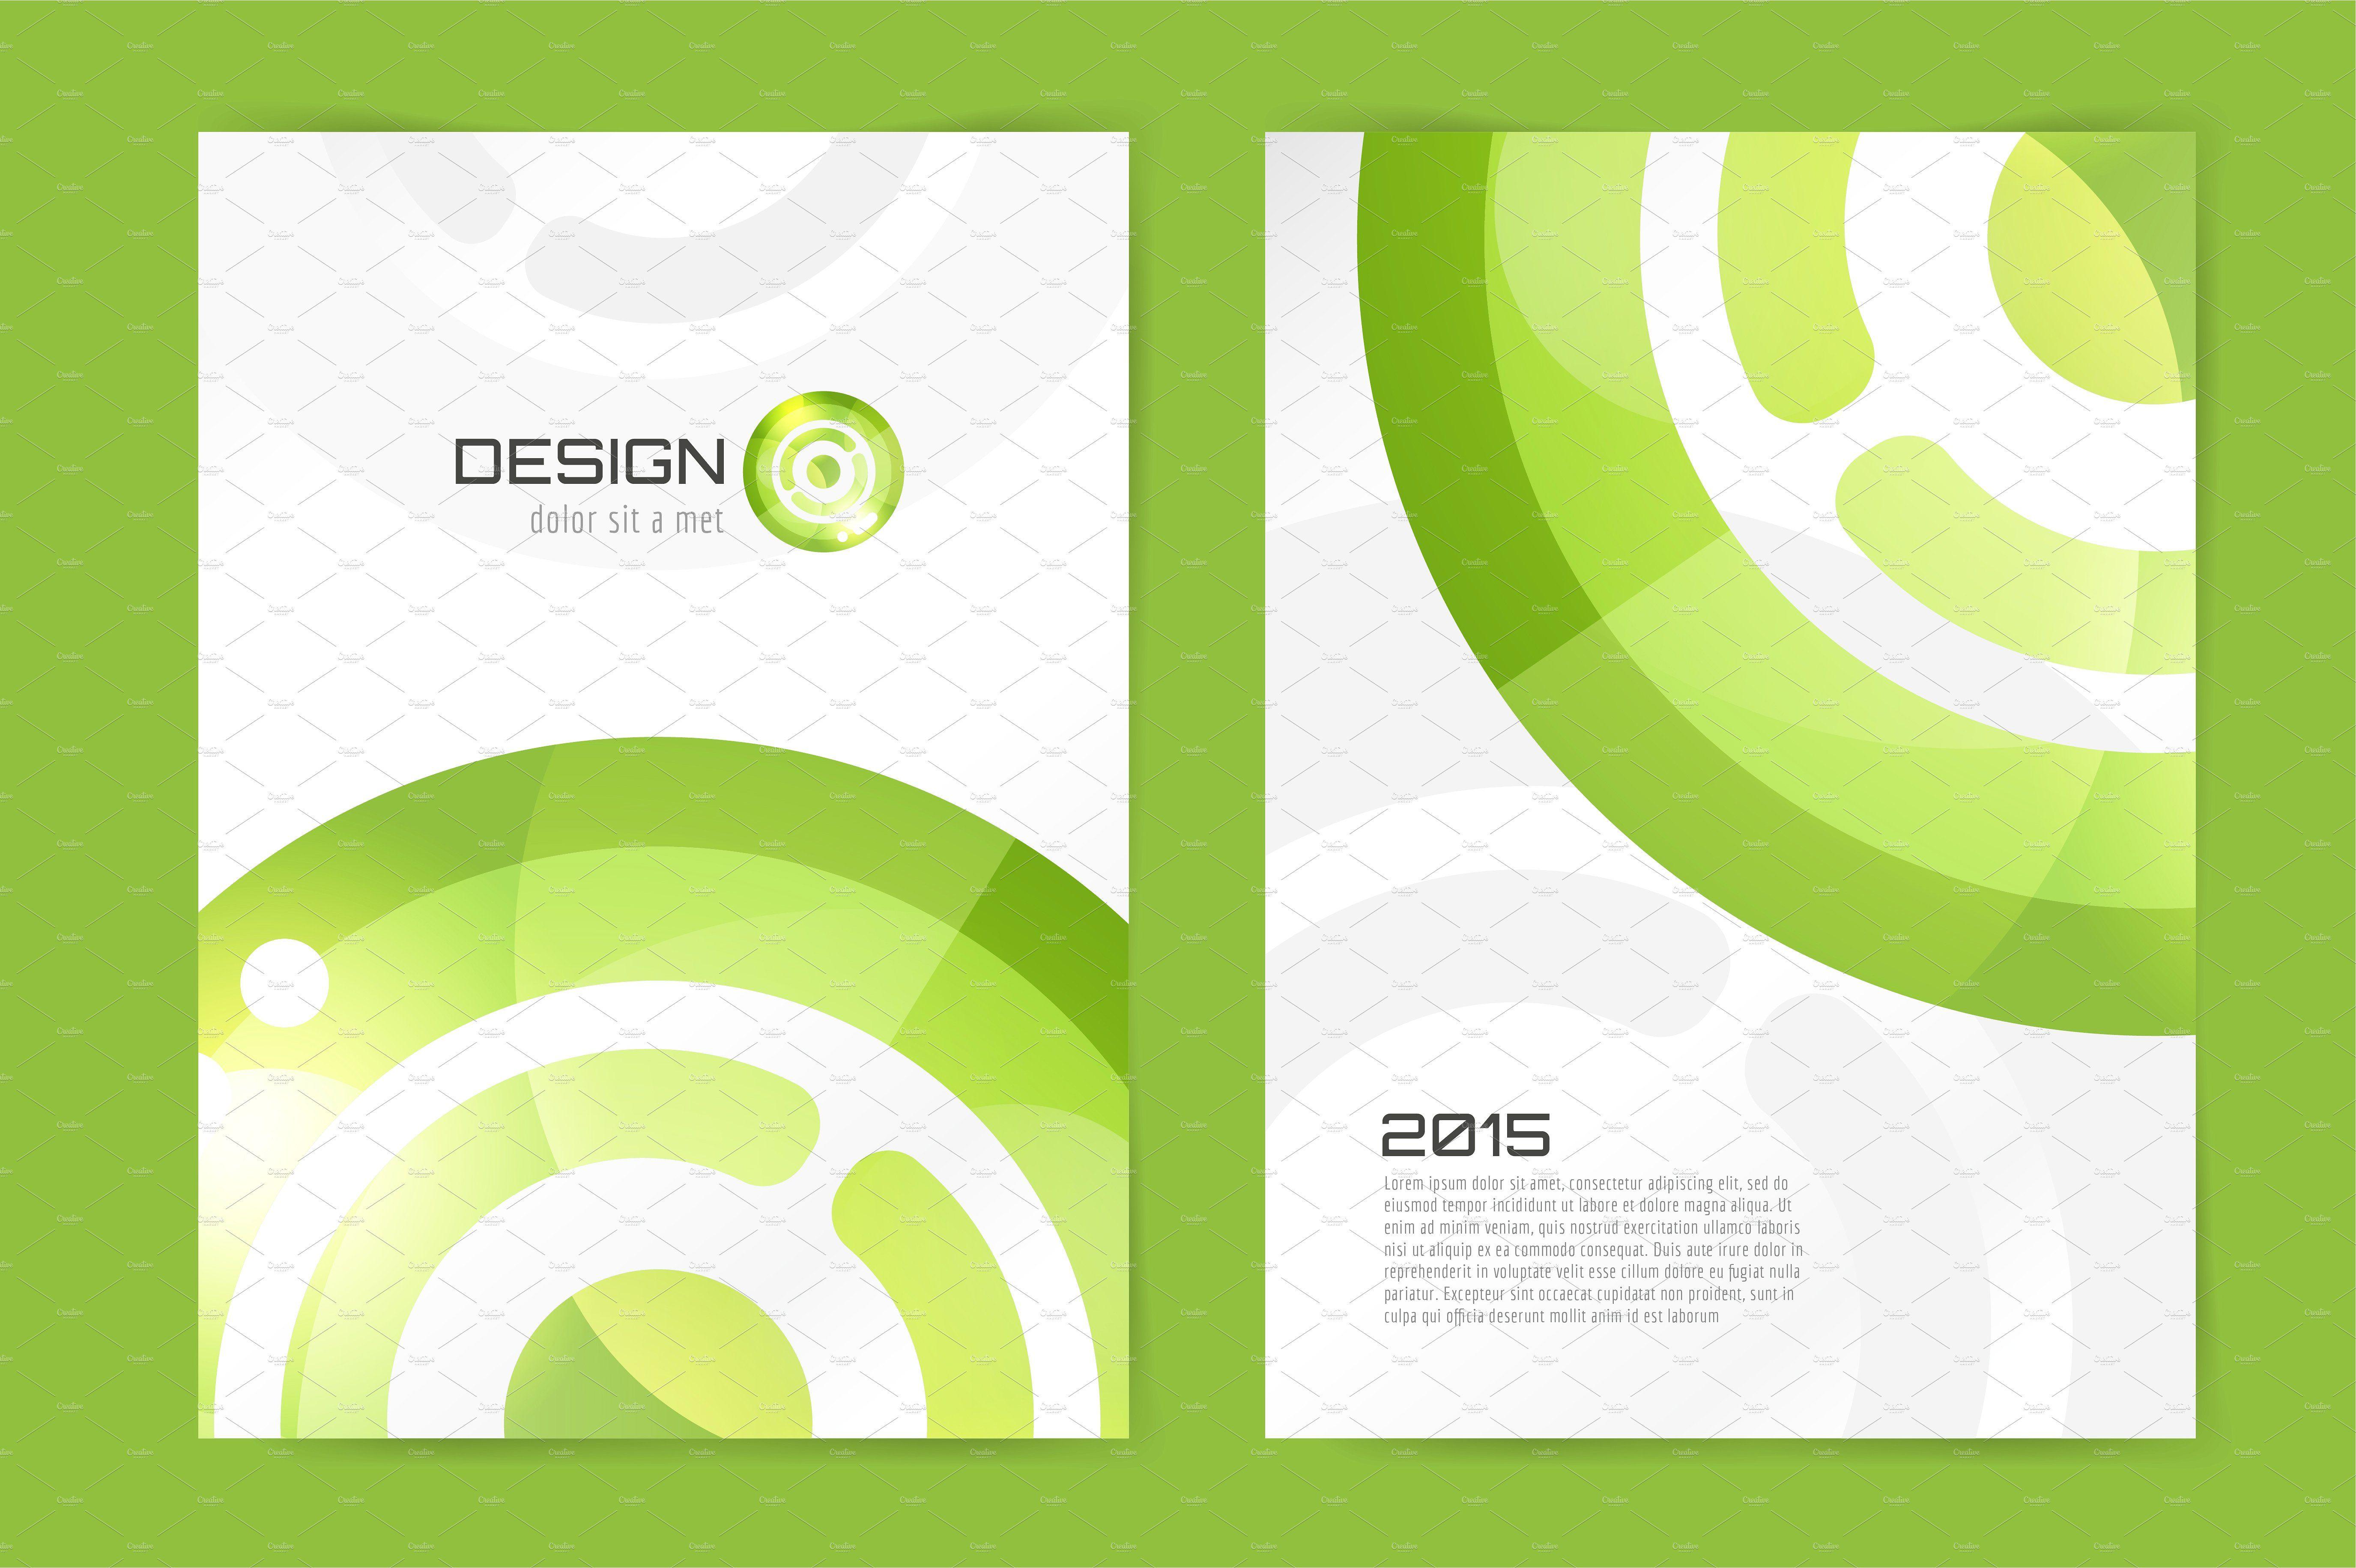 Vector Flyer Design Template Flyer Design Templates Flyer Design Flyer Template